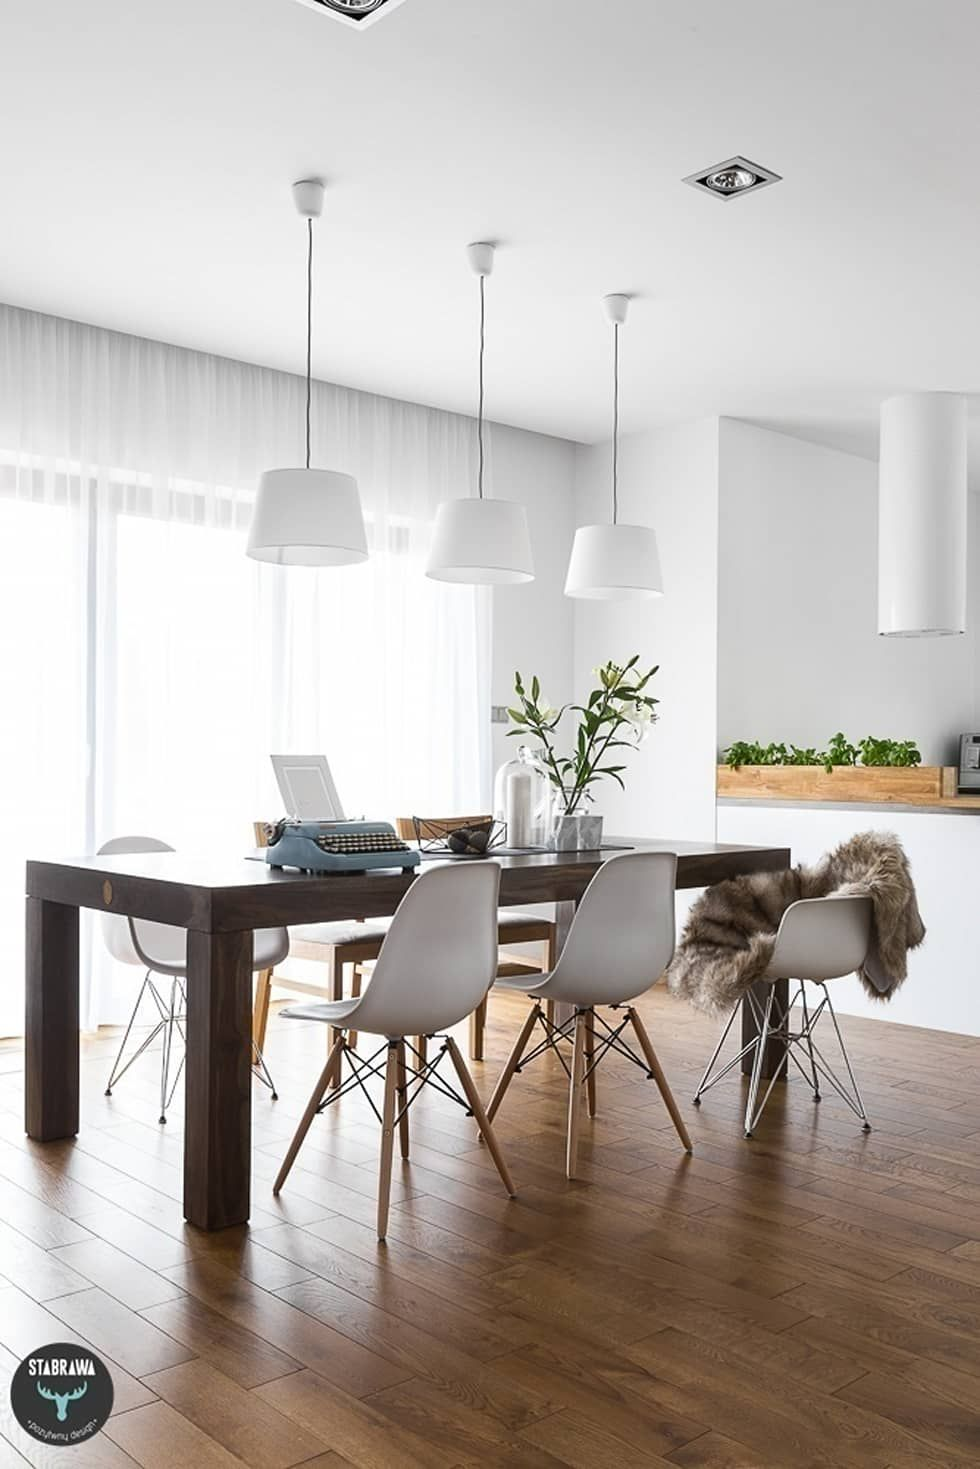 Wohnideen, Interior Design, Einrichtungsideen U0026 Bilder. Skandinavisches  EsszimmerIdeenSkandinavisch ...